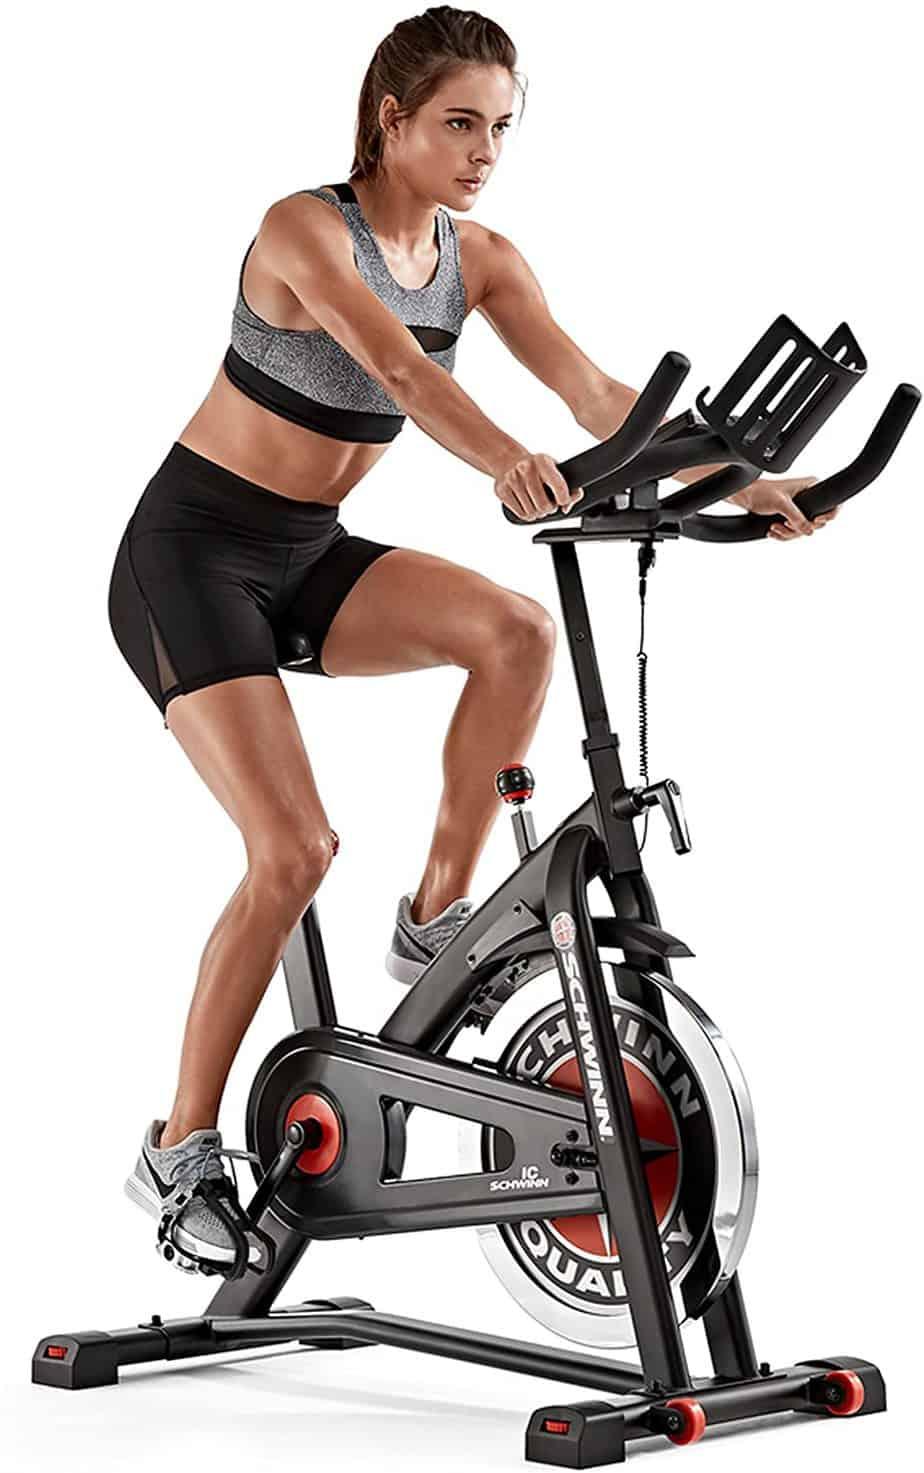 Schwinn IC3 Indoor Cycling Exercise Bike